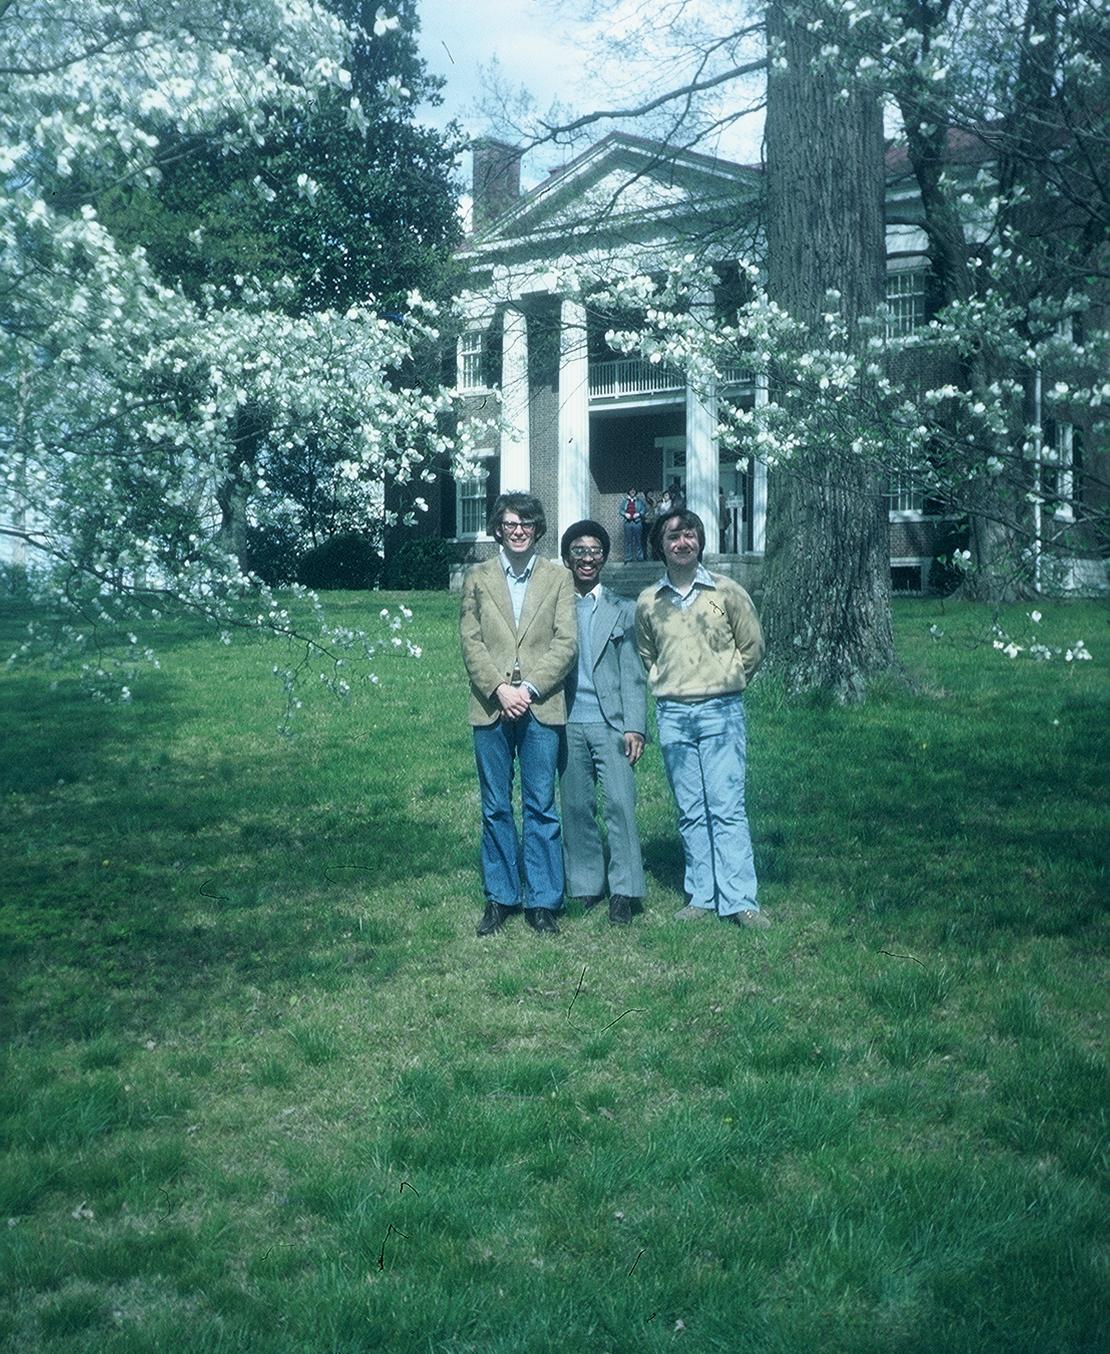 Spring_tour_1976_Monticello_staudt4-R1-E041.jpg